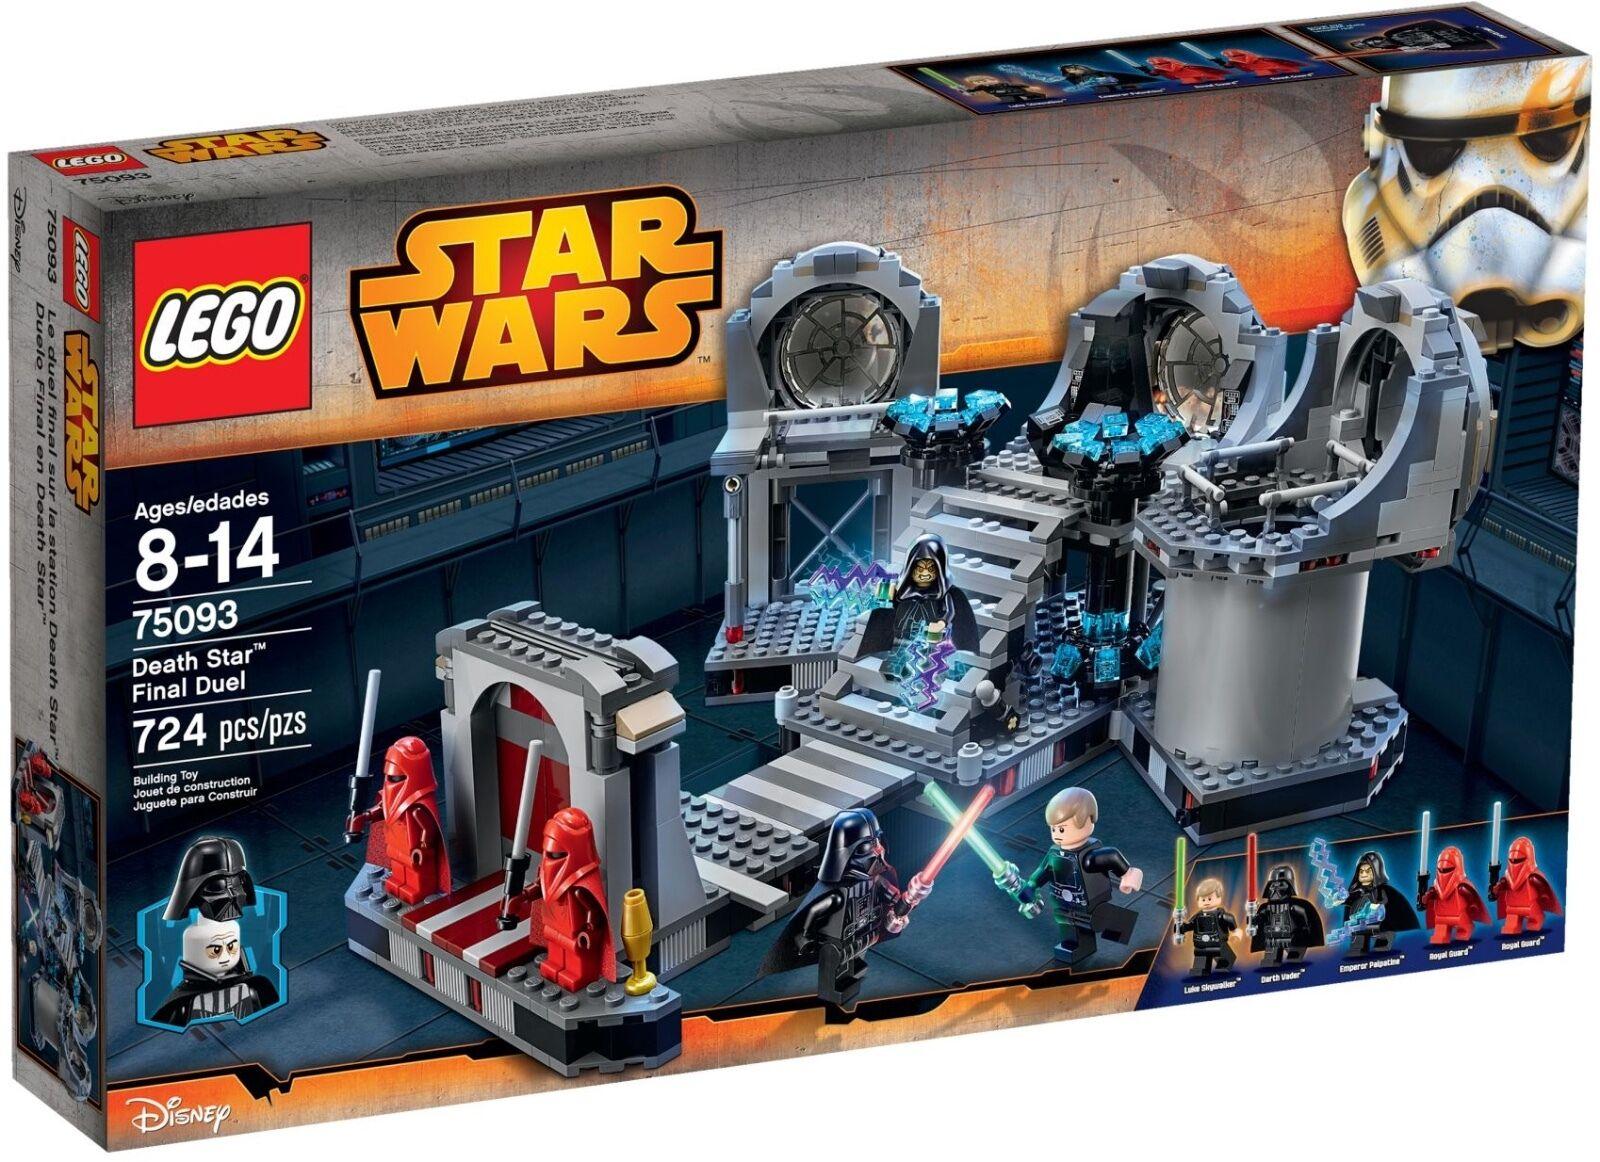 LEGO Star Wars 75093 - Death Star Final Duel  NEW & SEALED